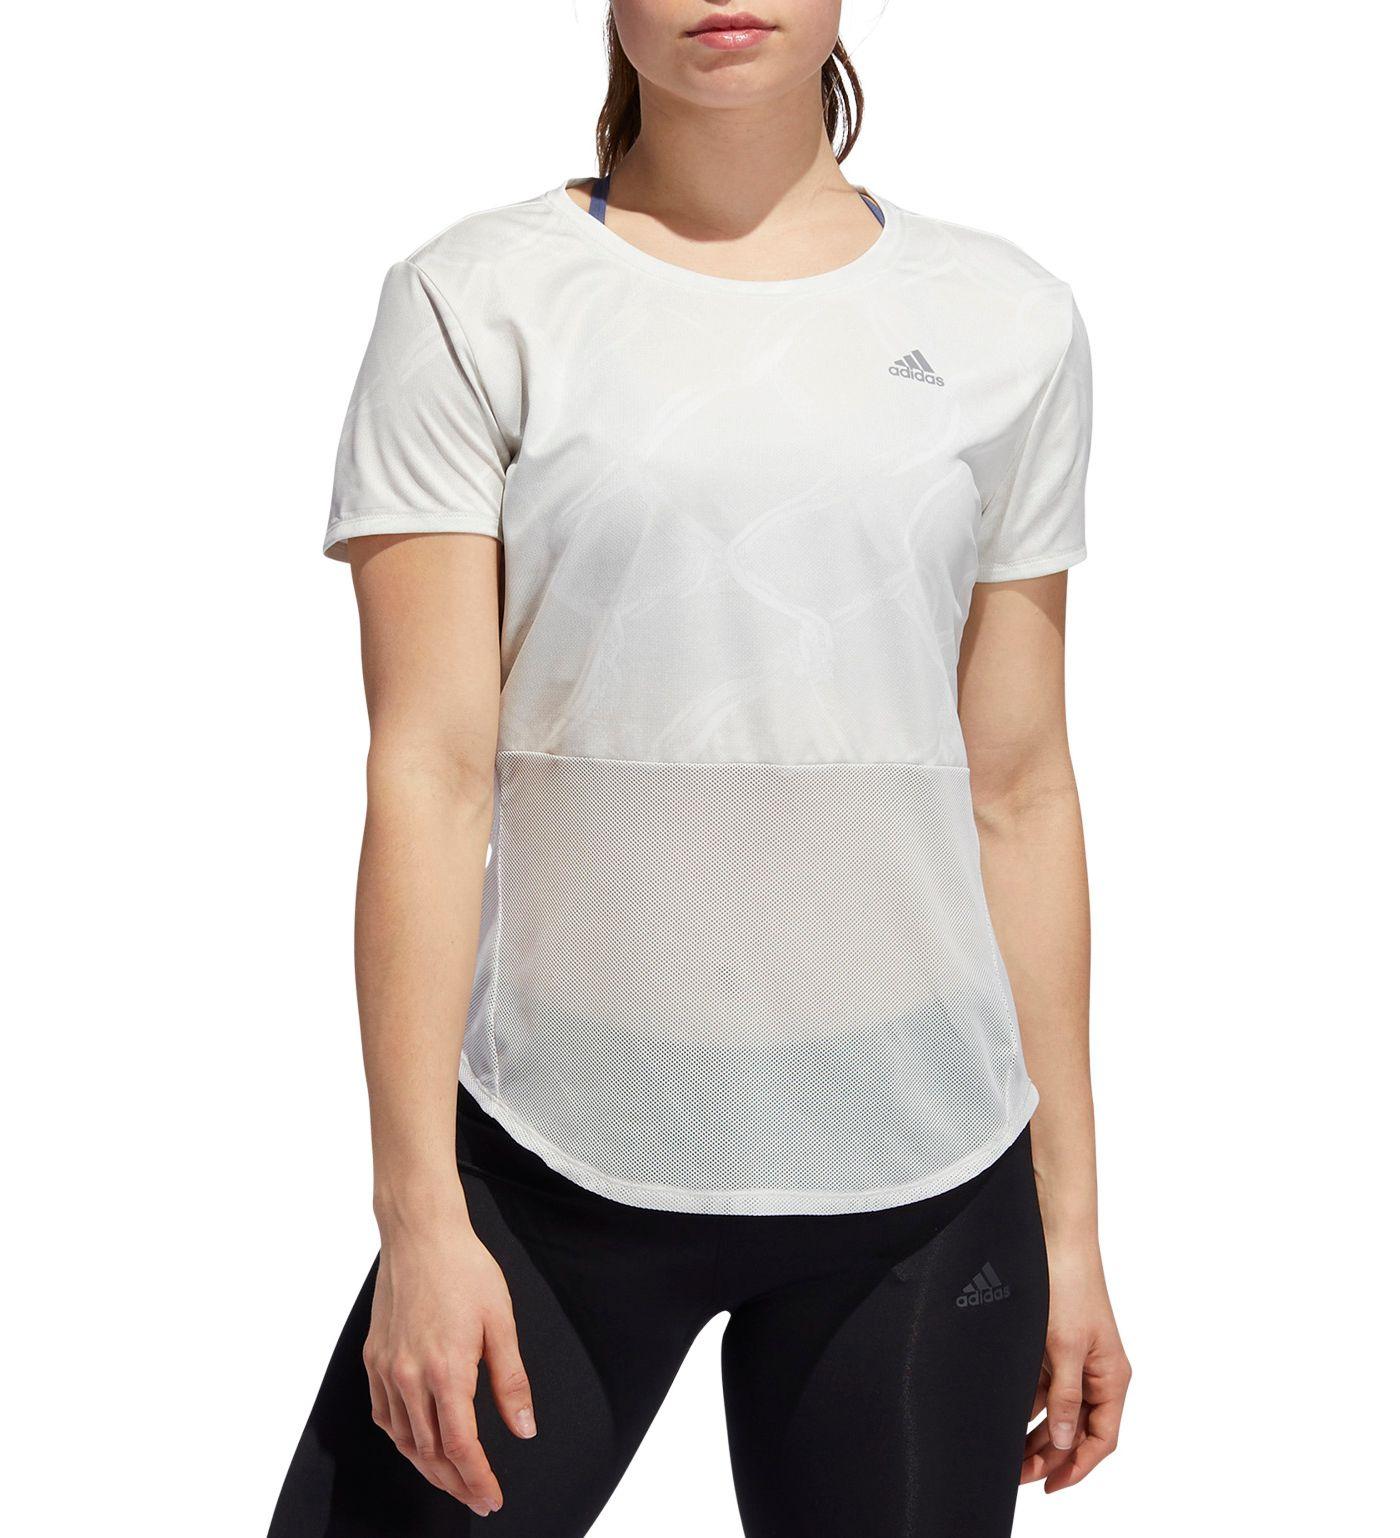 adidas Women's Own The Run Fences T-Shirt